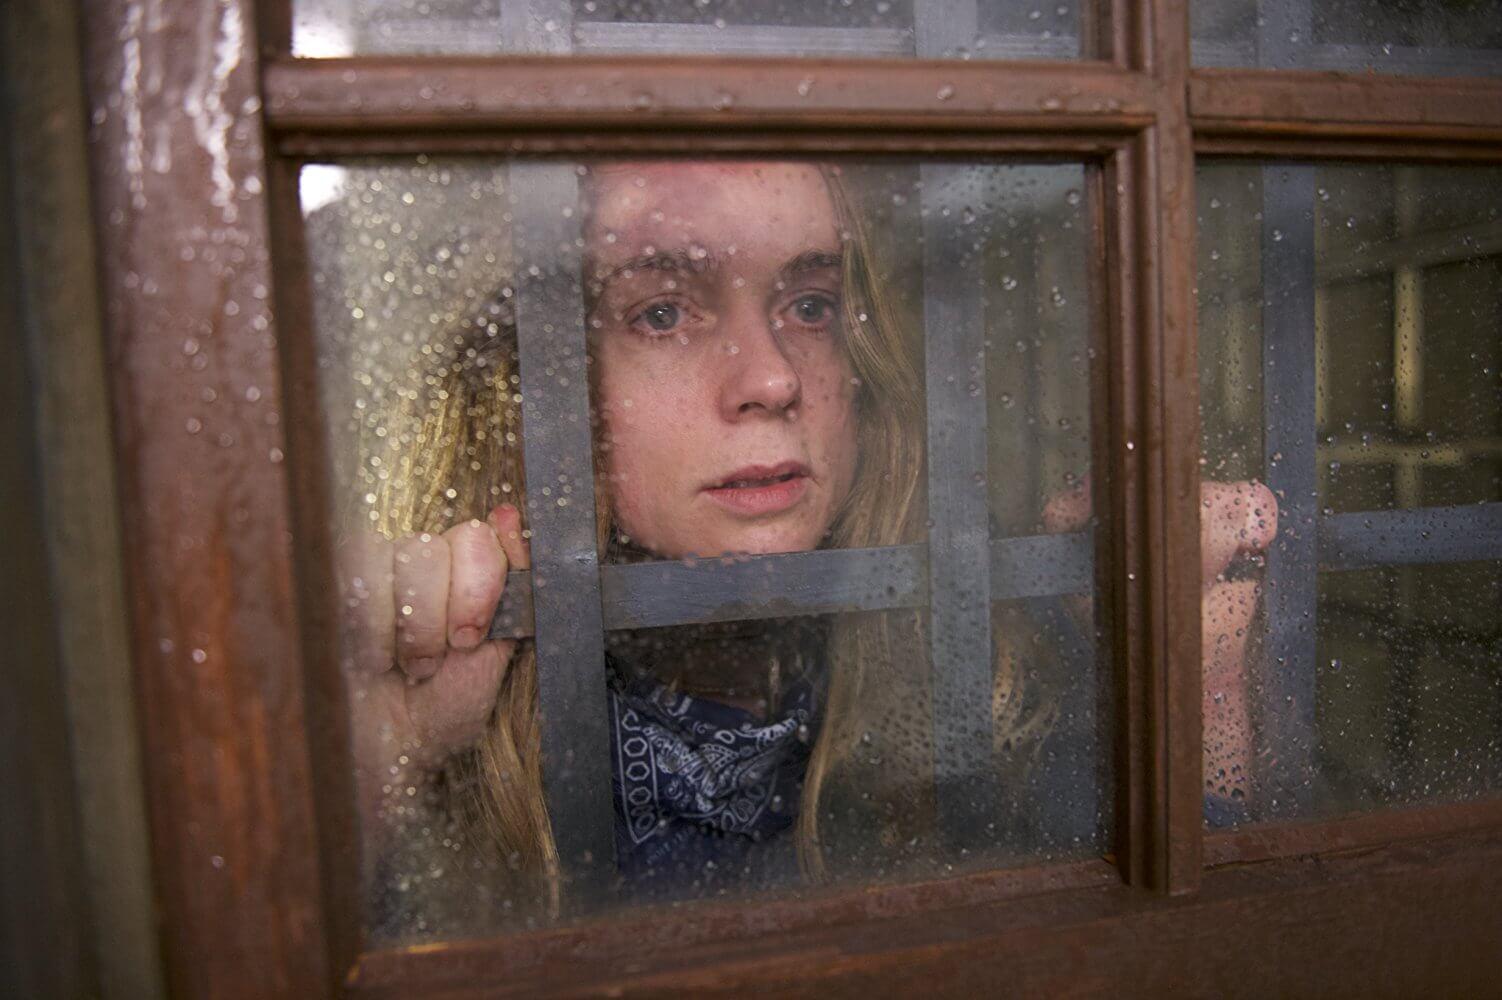 Cô gái bị giam cầm - Bad Samaritan